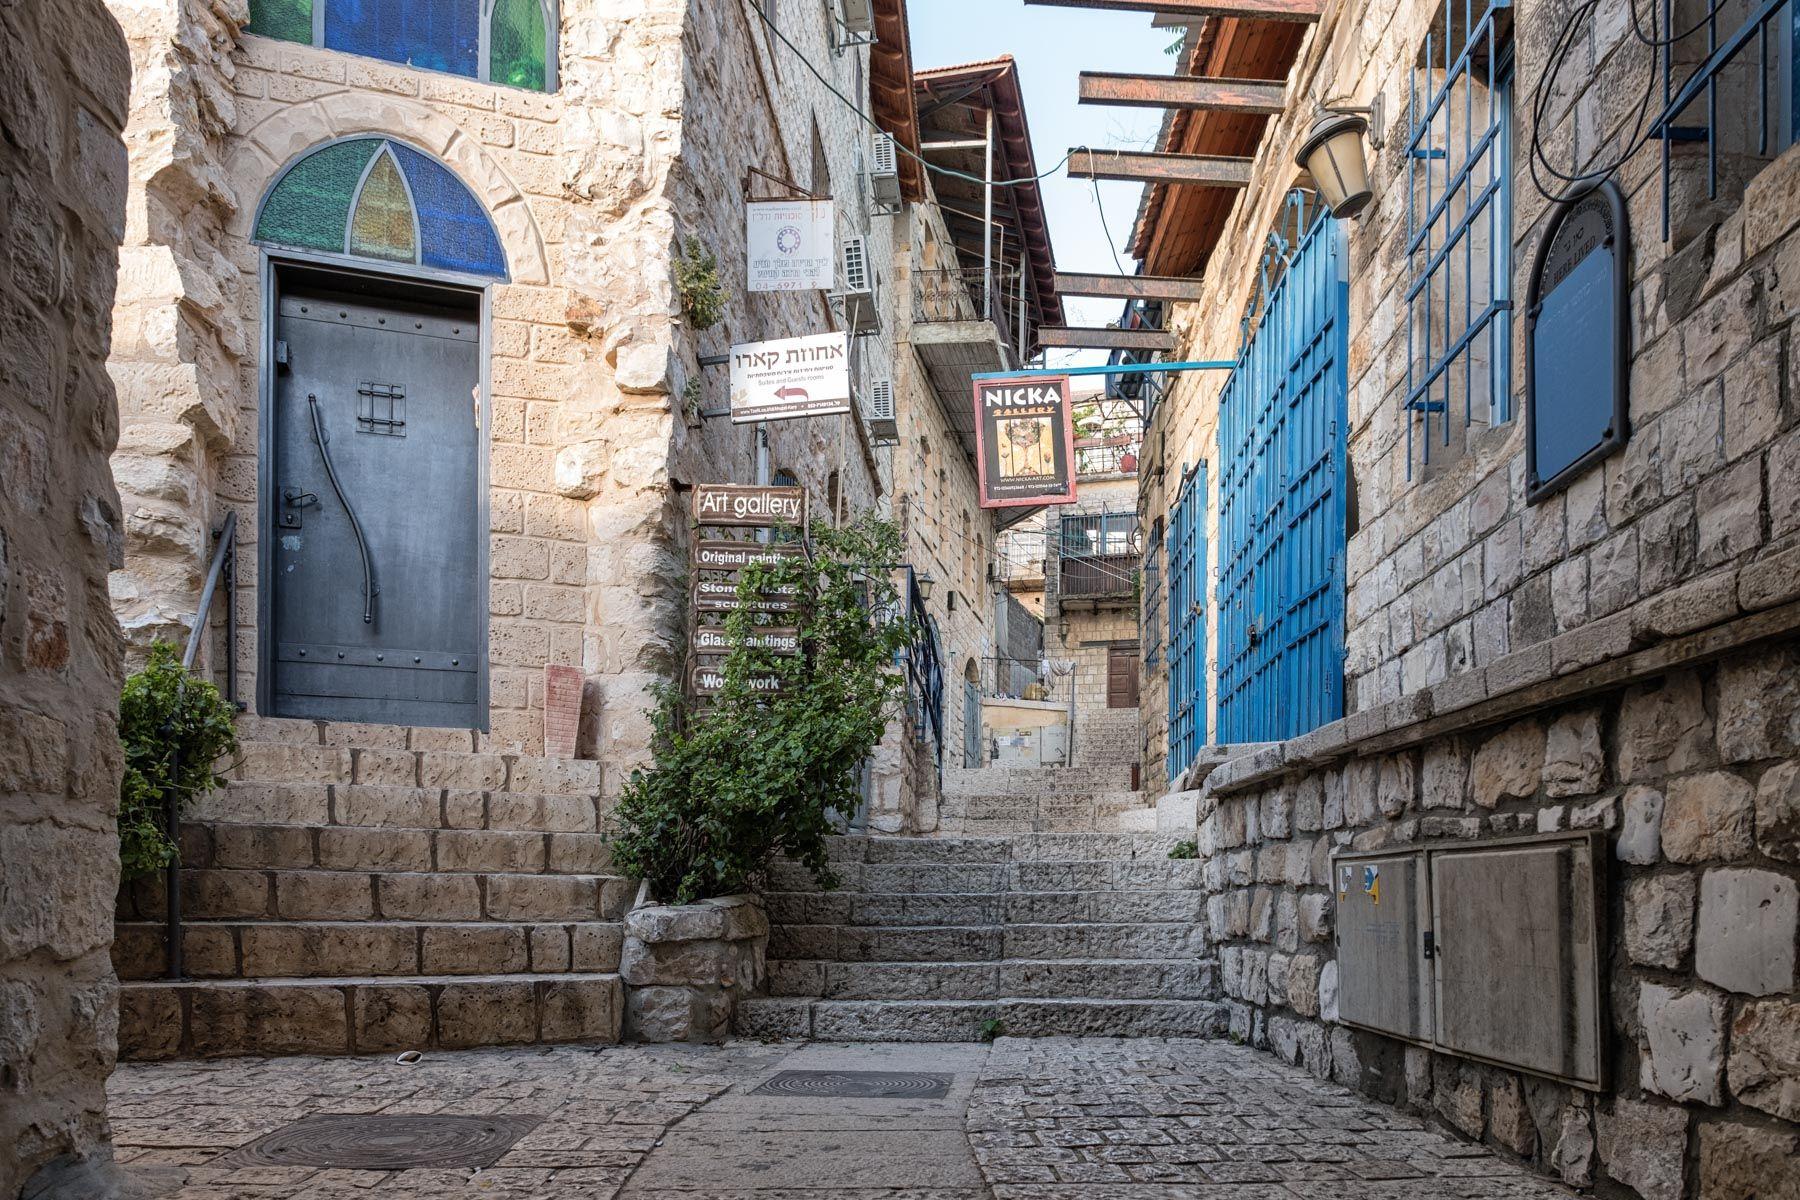 Tsfat, Israel 05/06/17